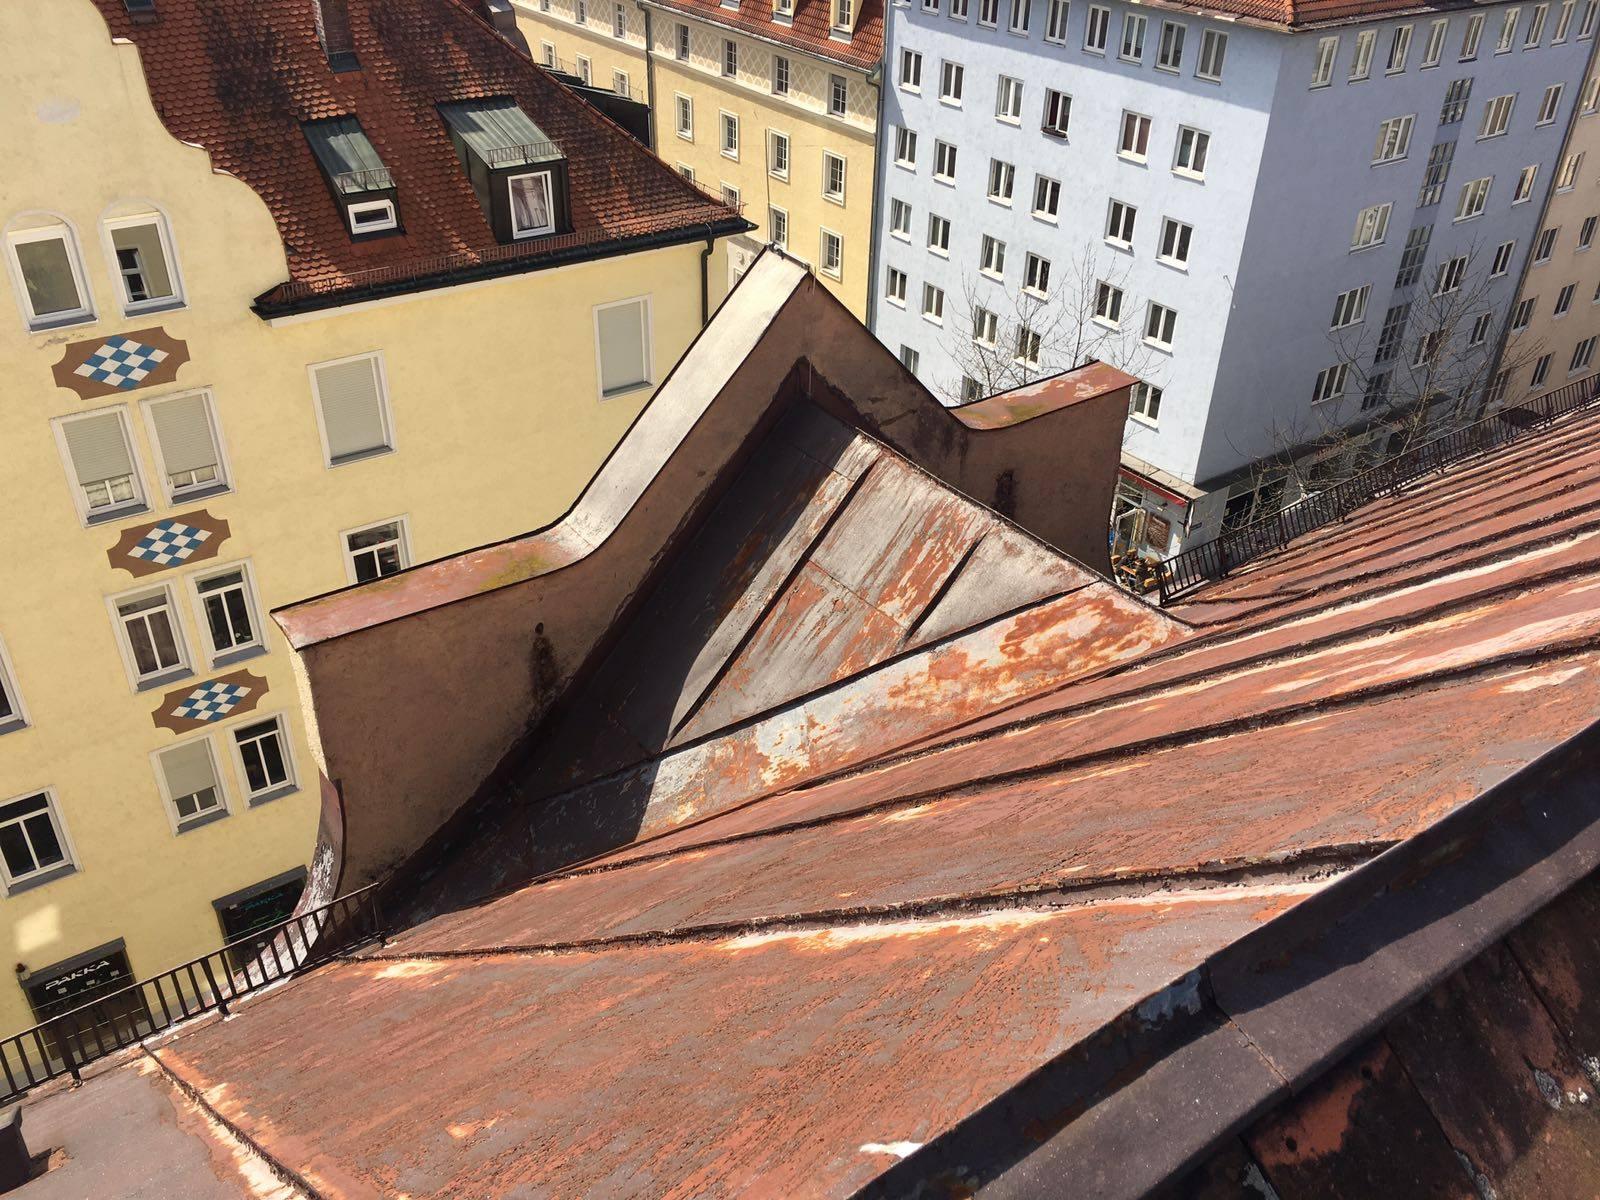 Altbausanierung München dachdecker münchen altbausanierung 05 clauss bedachungen